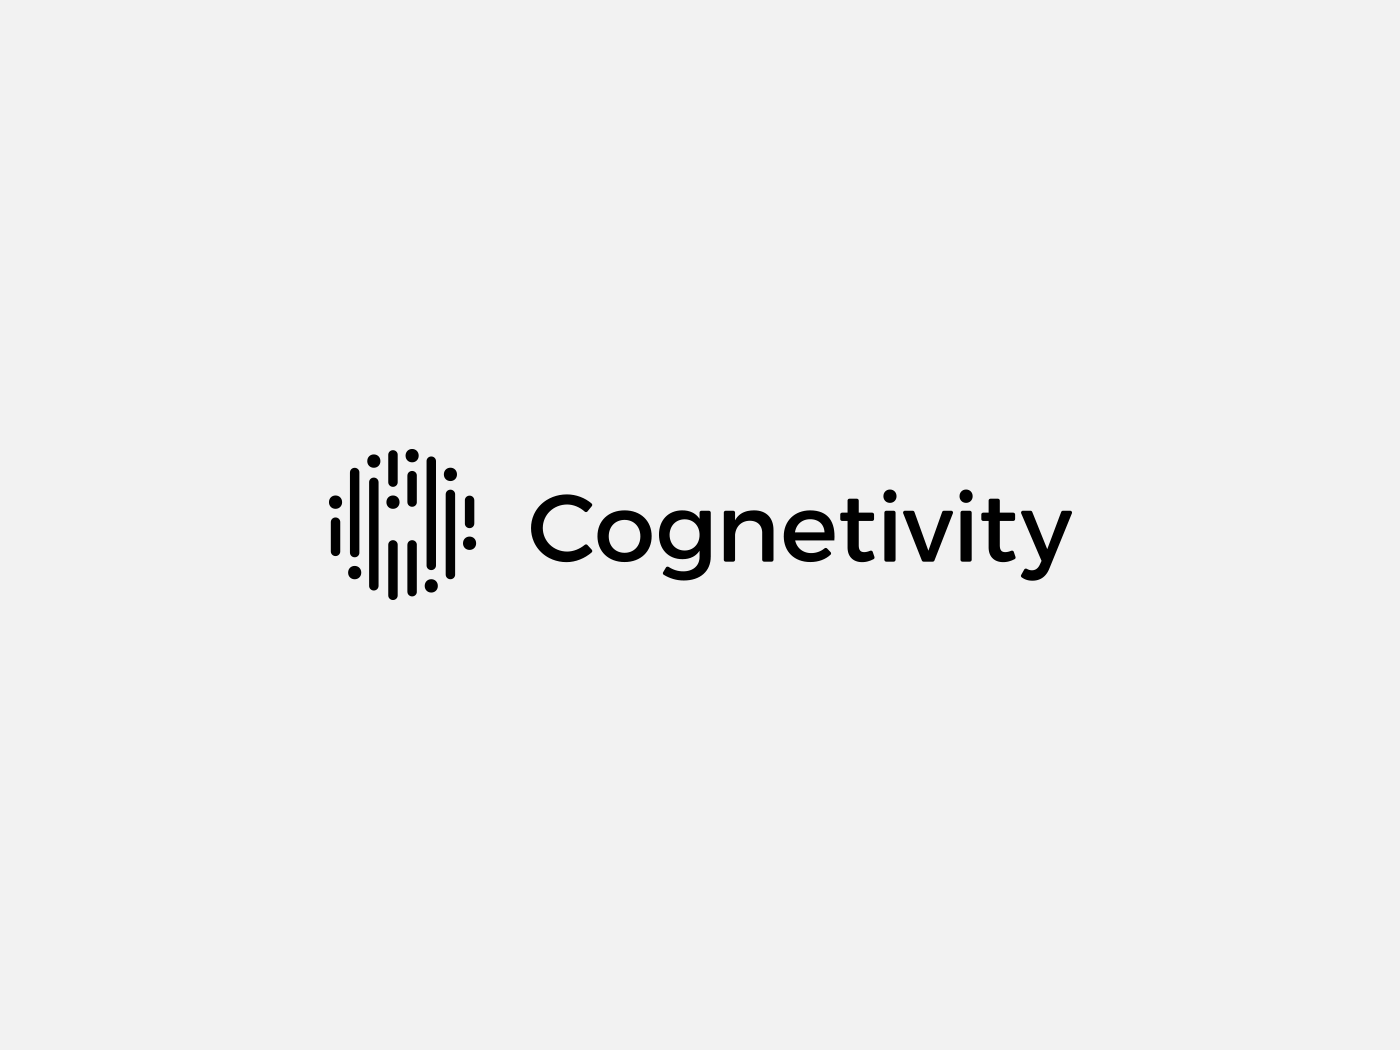 Cognetivity secondary logo, black